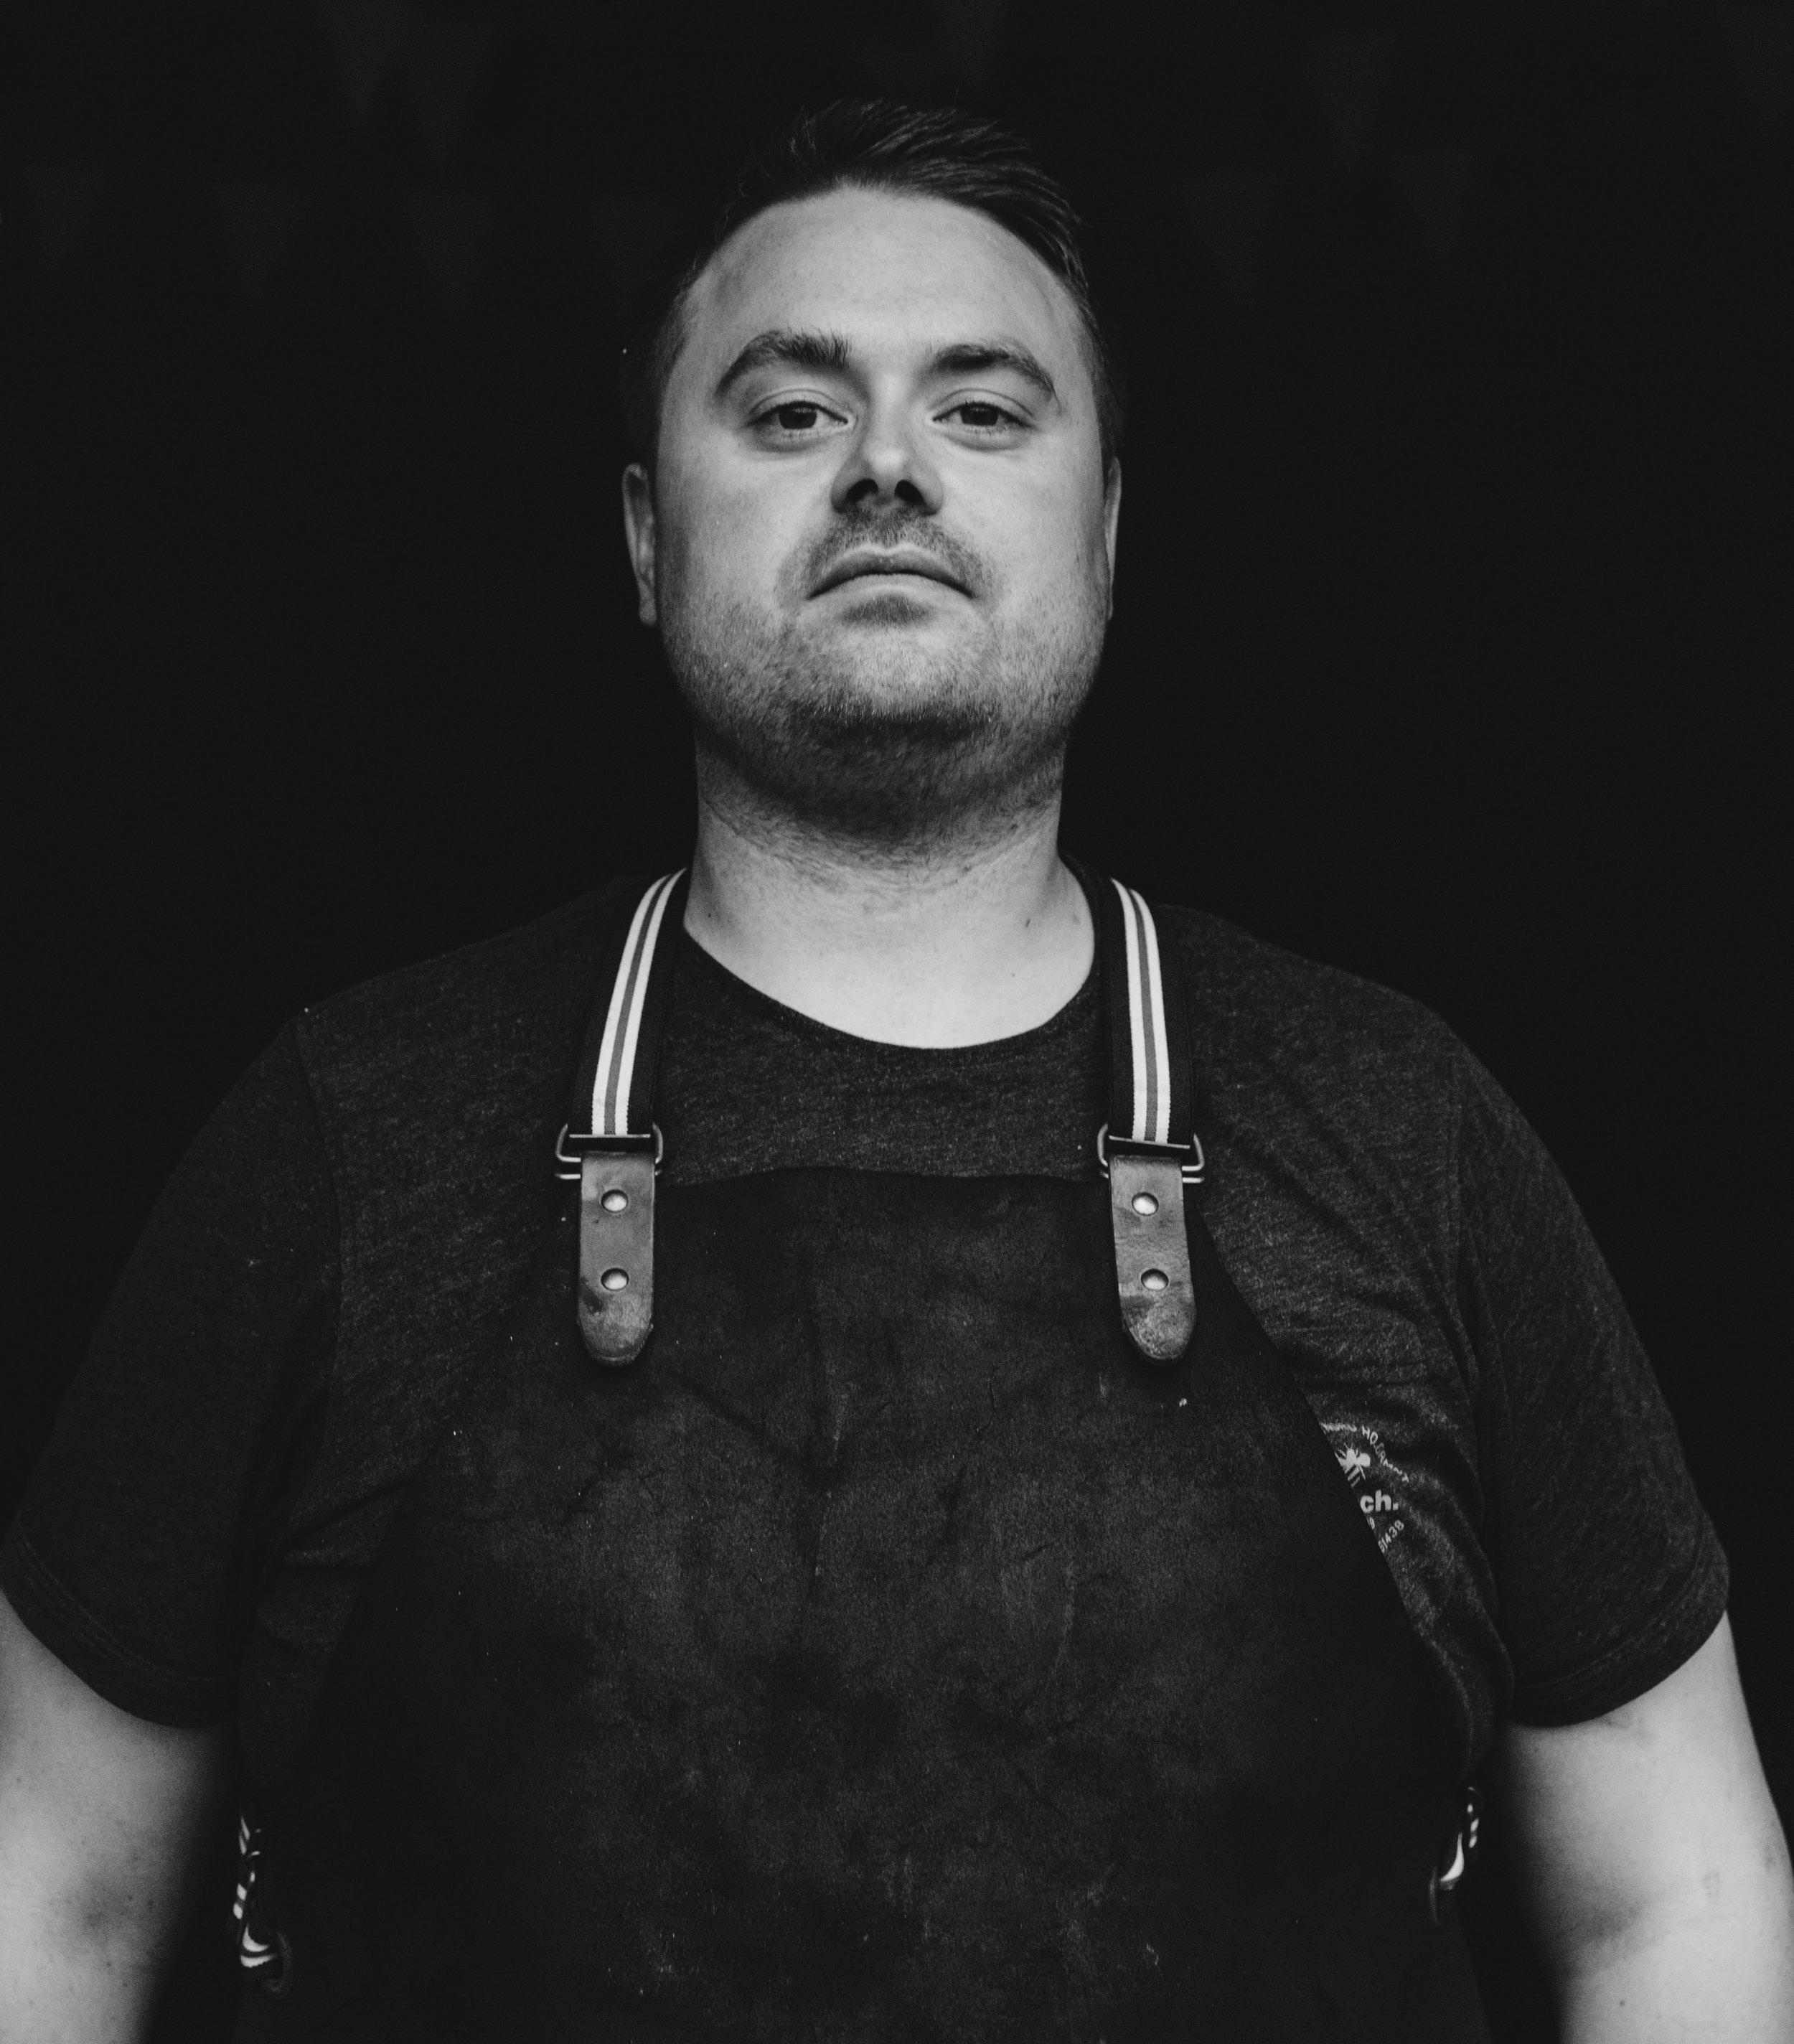 Irish Chef Portrait Toronto Food photographer - Suech and Beck